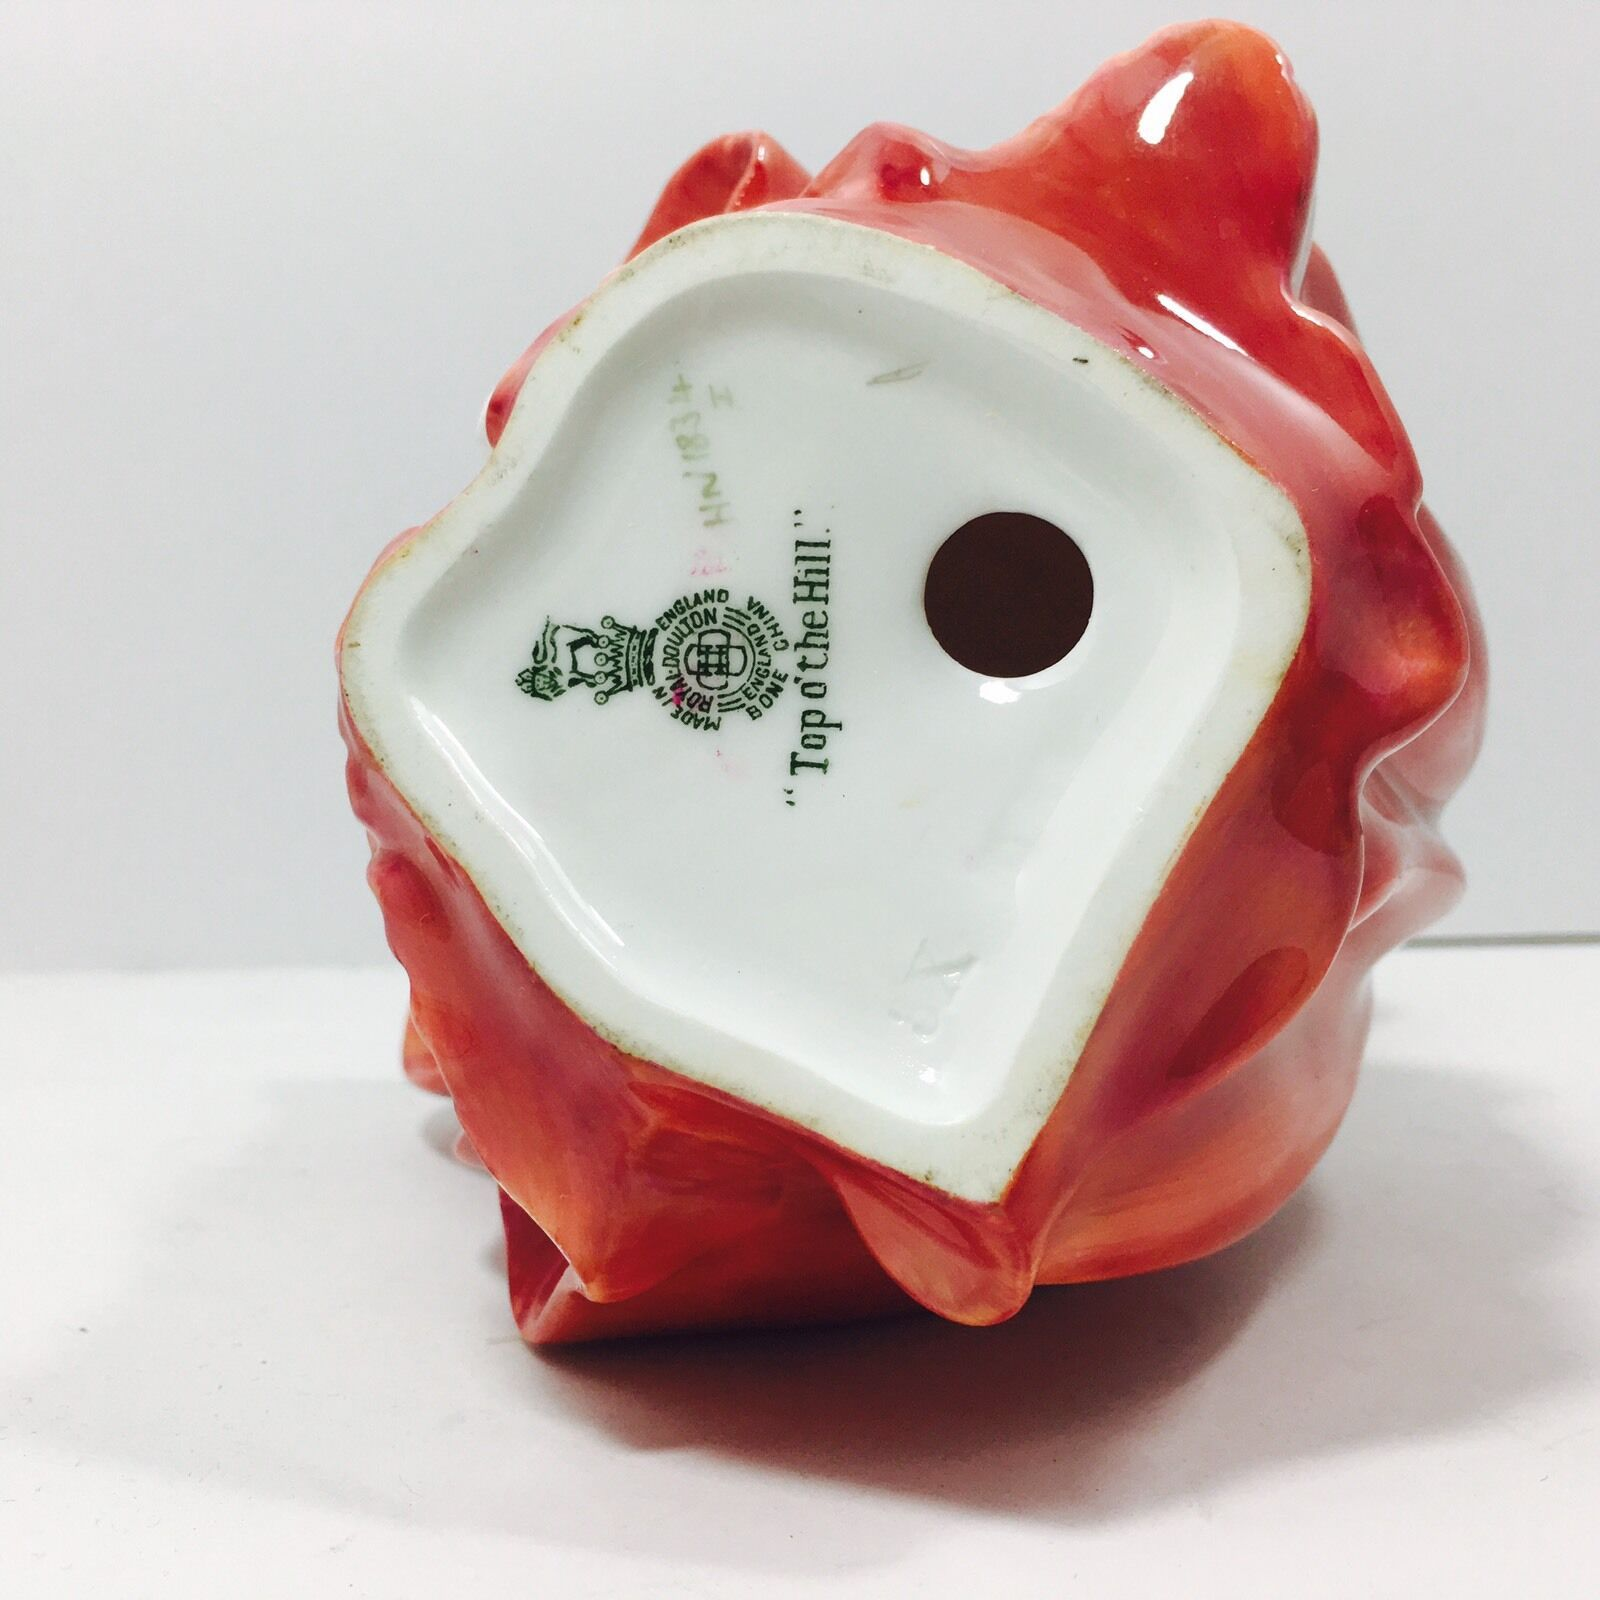 "Royal Doulton Vintage"" Parte Superior Del Colina"" ( Hn 1834 Alto) Porcelana Fina"